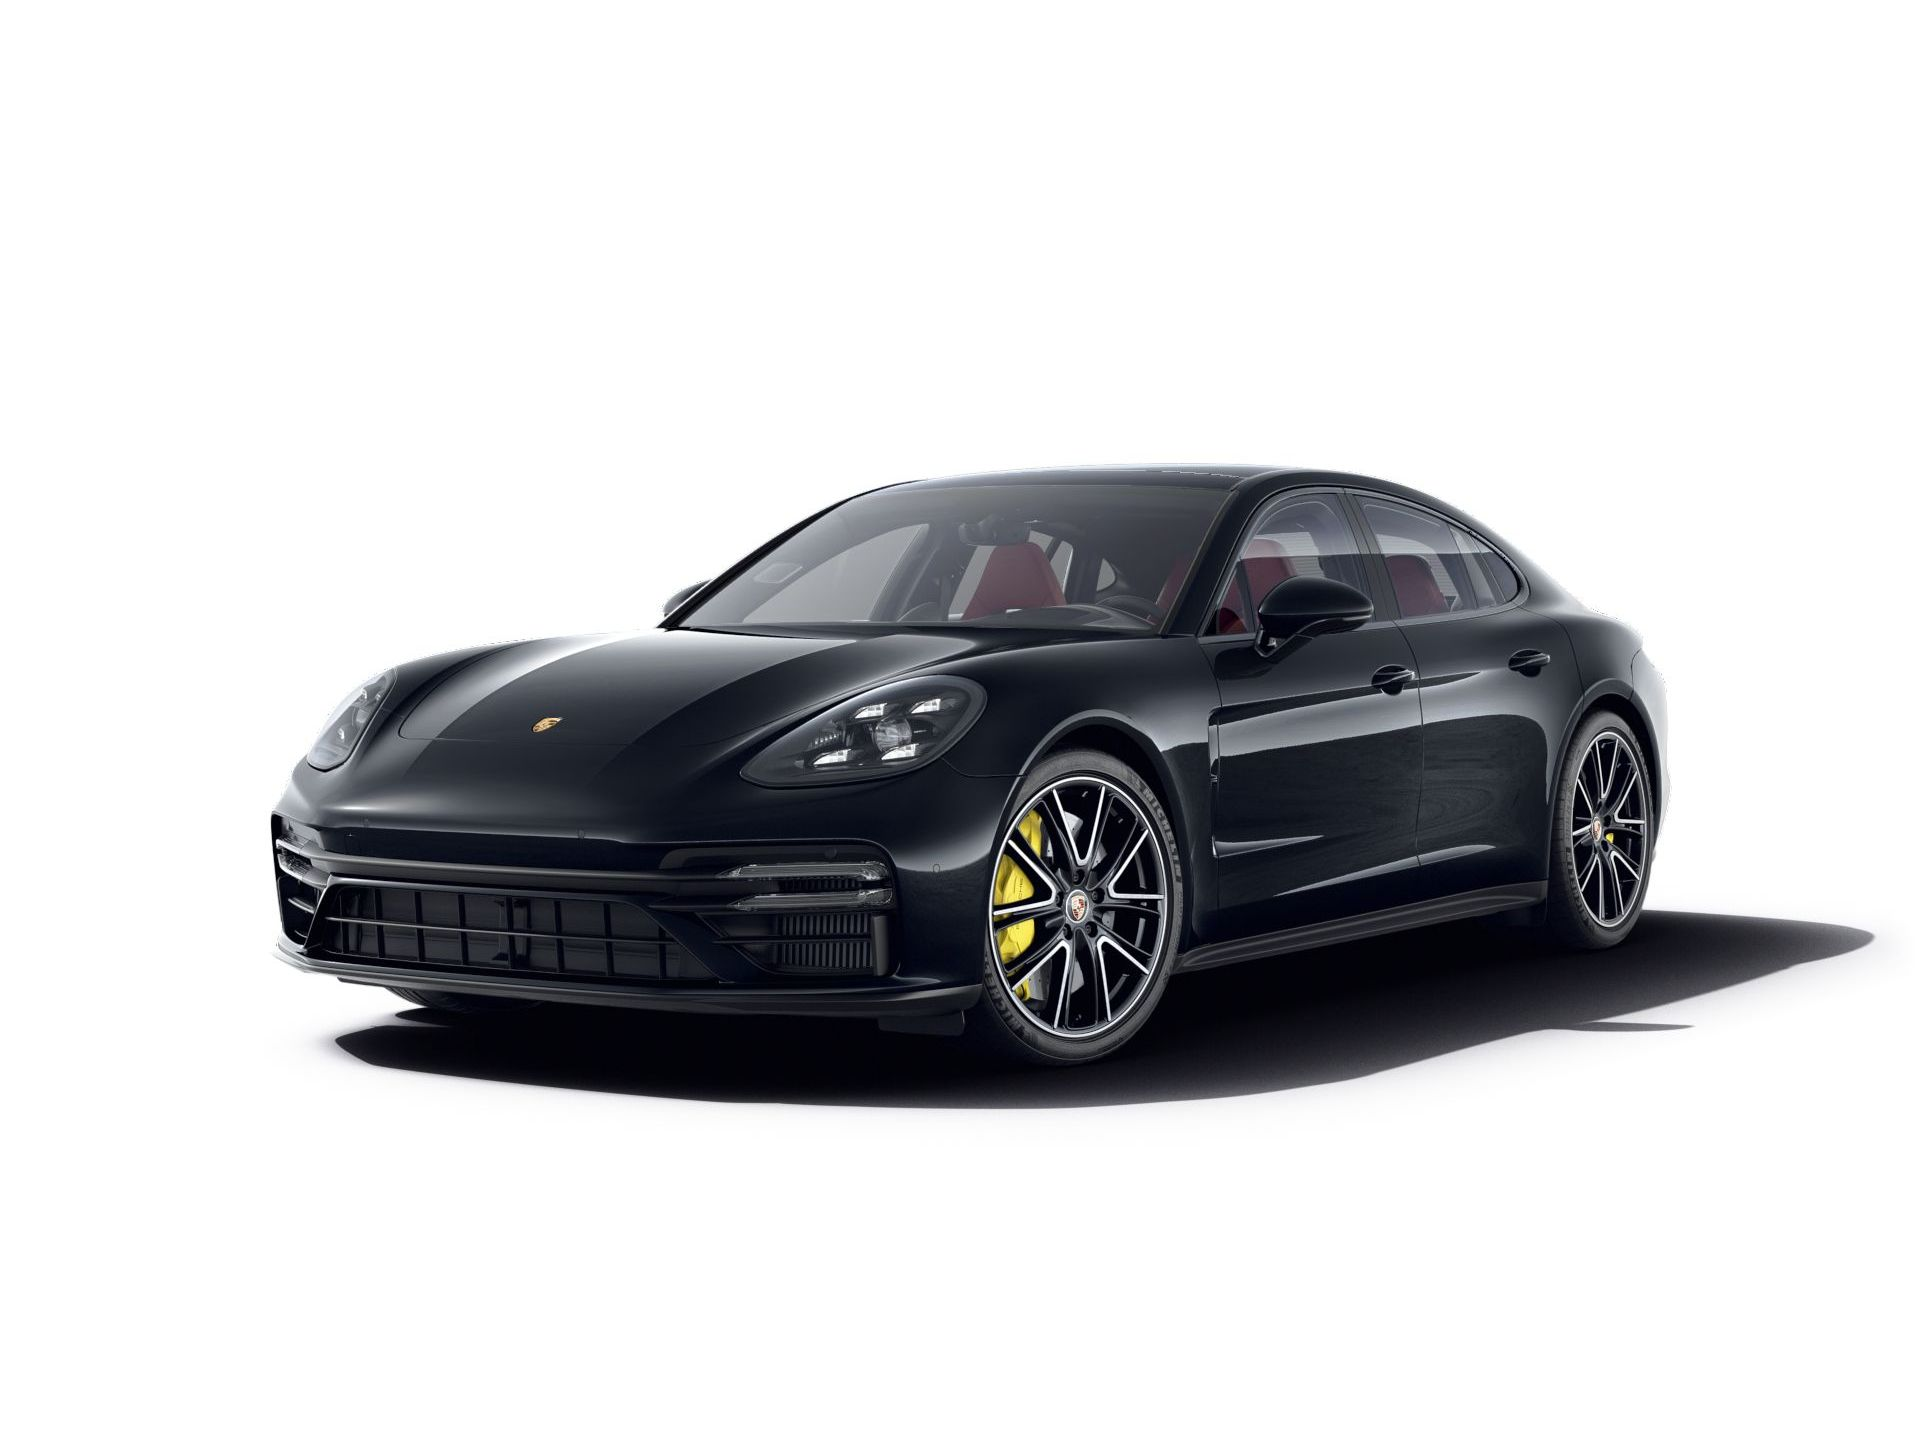 2021 Porsche Panamera Turbo S – 1